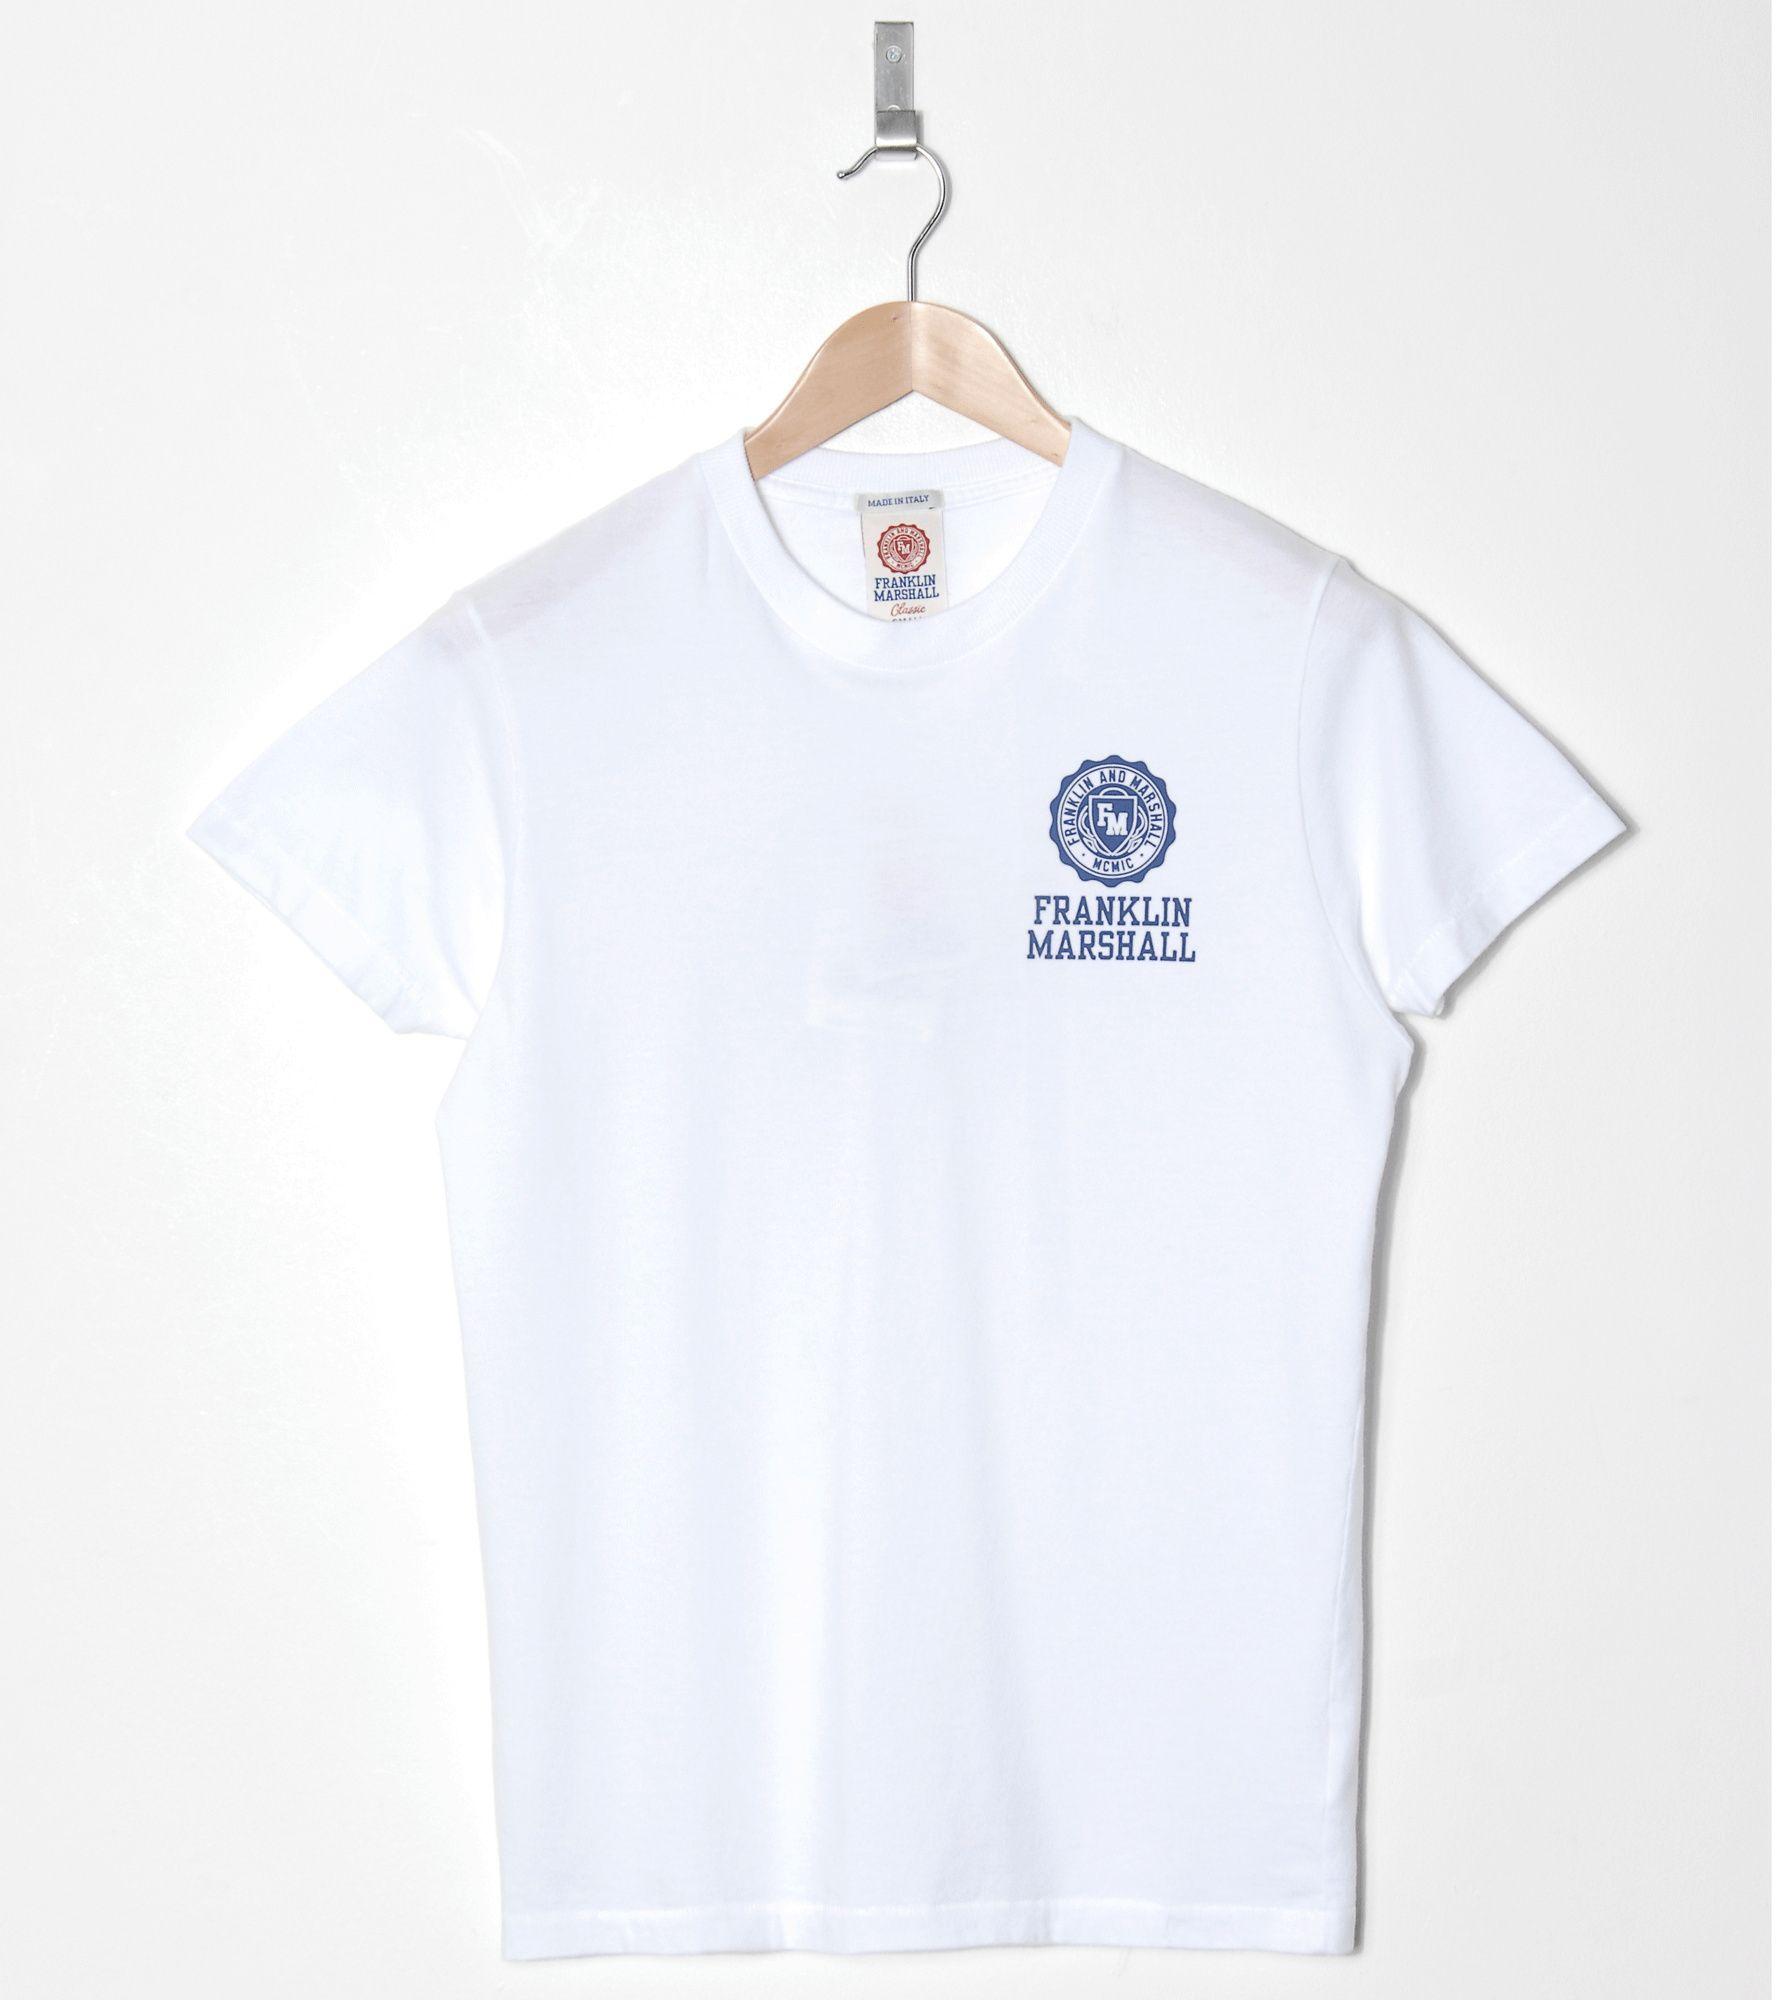 Franklin marshall chest logo t shirt size for T shirt left chest logo size